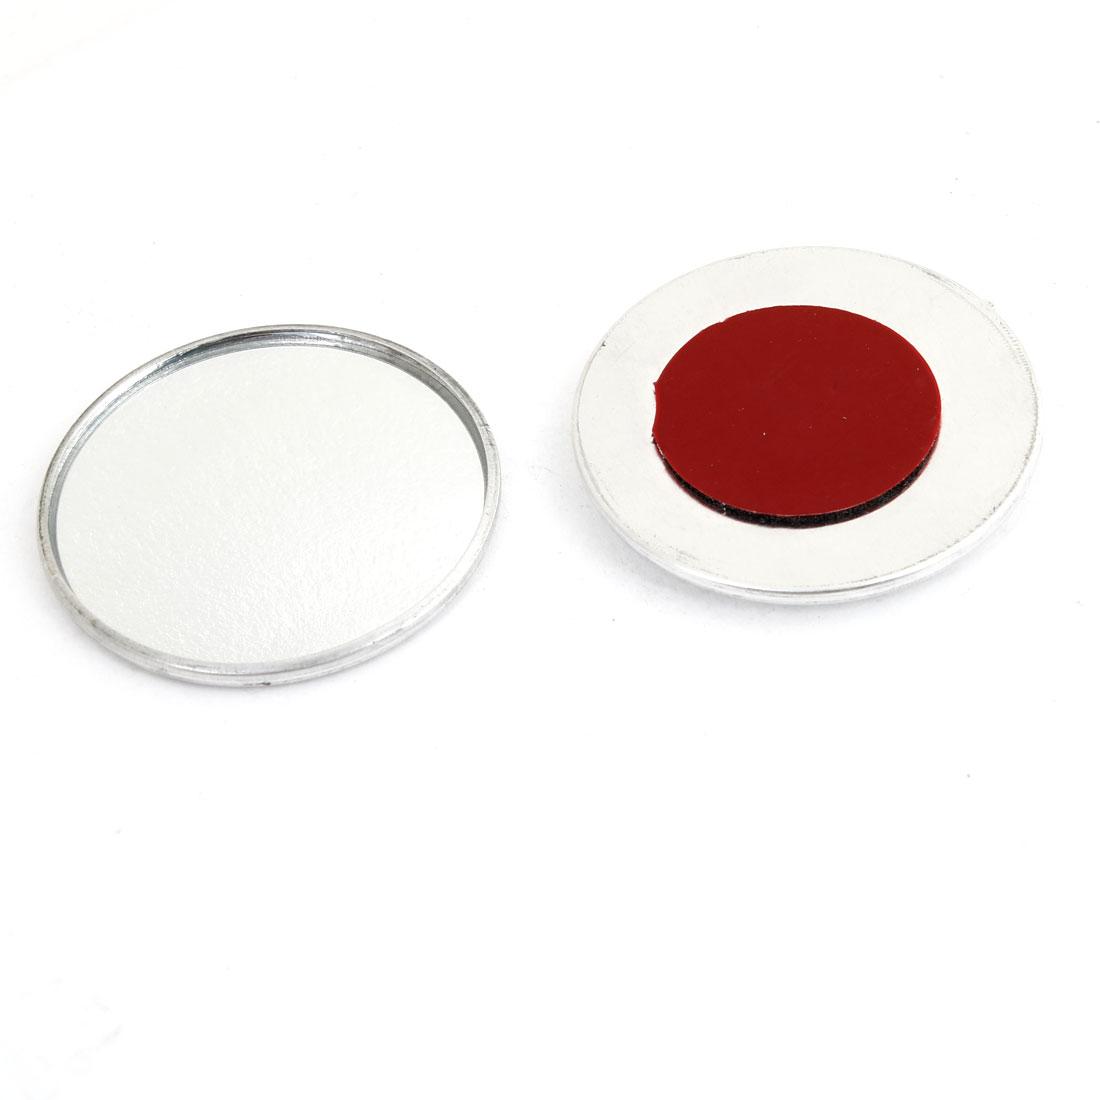 "2Pcs Silver Tone Car Round Convex Wide Angle Blind Spot Rear View Mirror 2"" Dia"